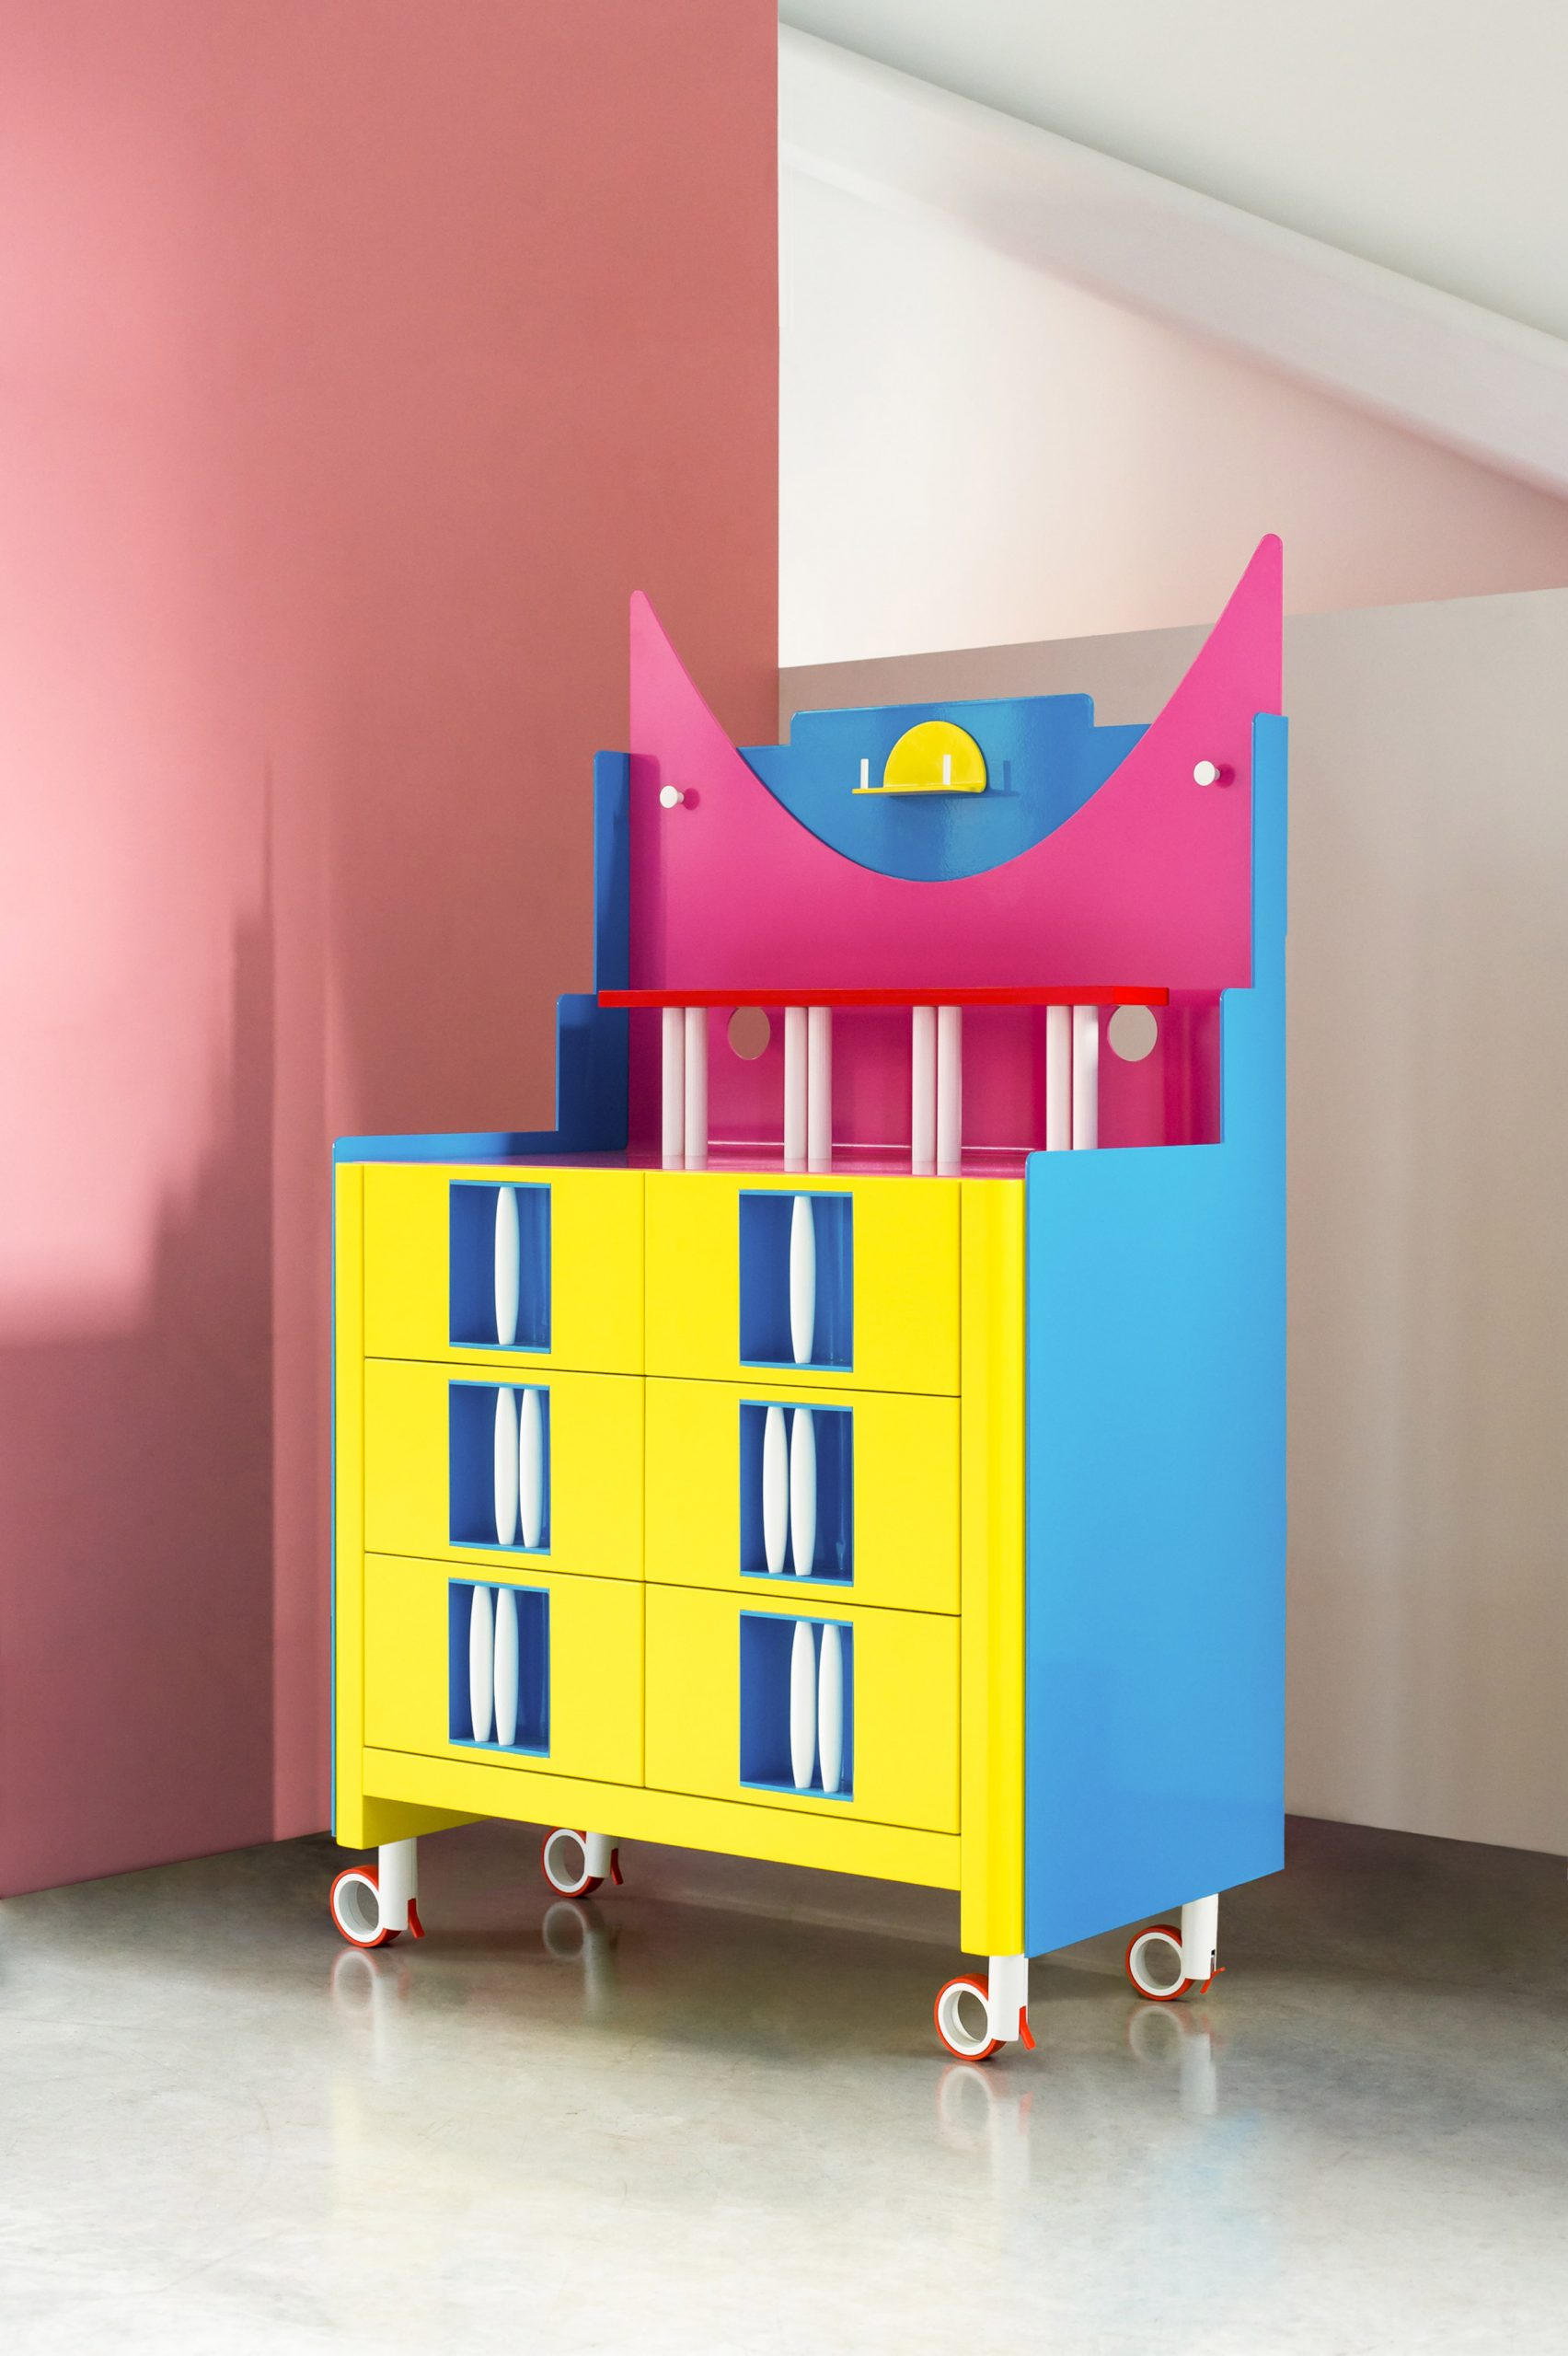 nakano-twins-adam-nathaniel-furman-furniture-design_dezeen_2364_col_2-1704x2560.jpg